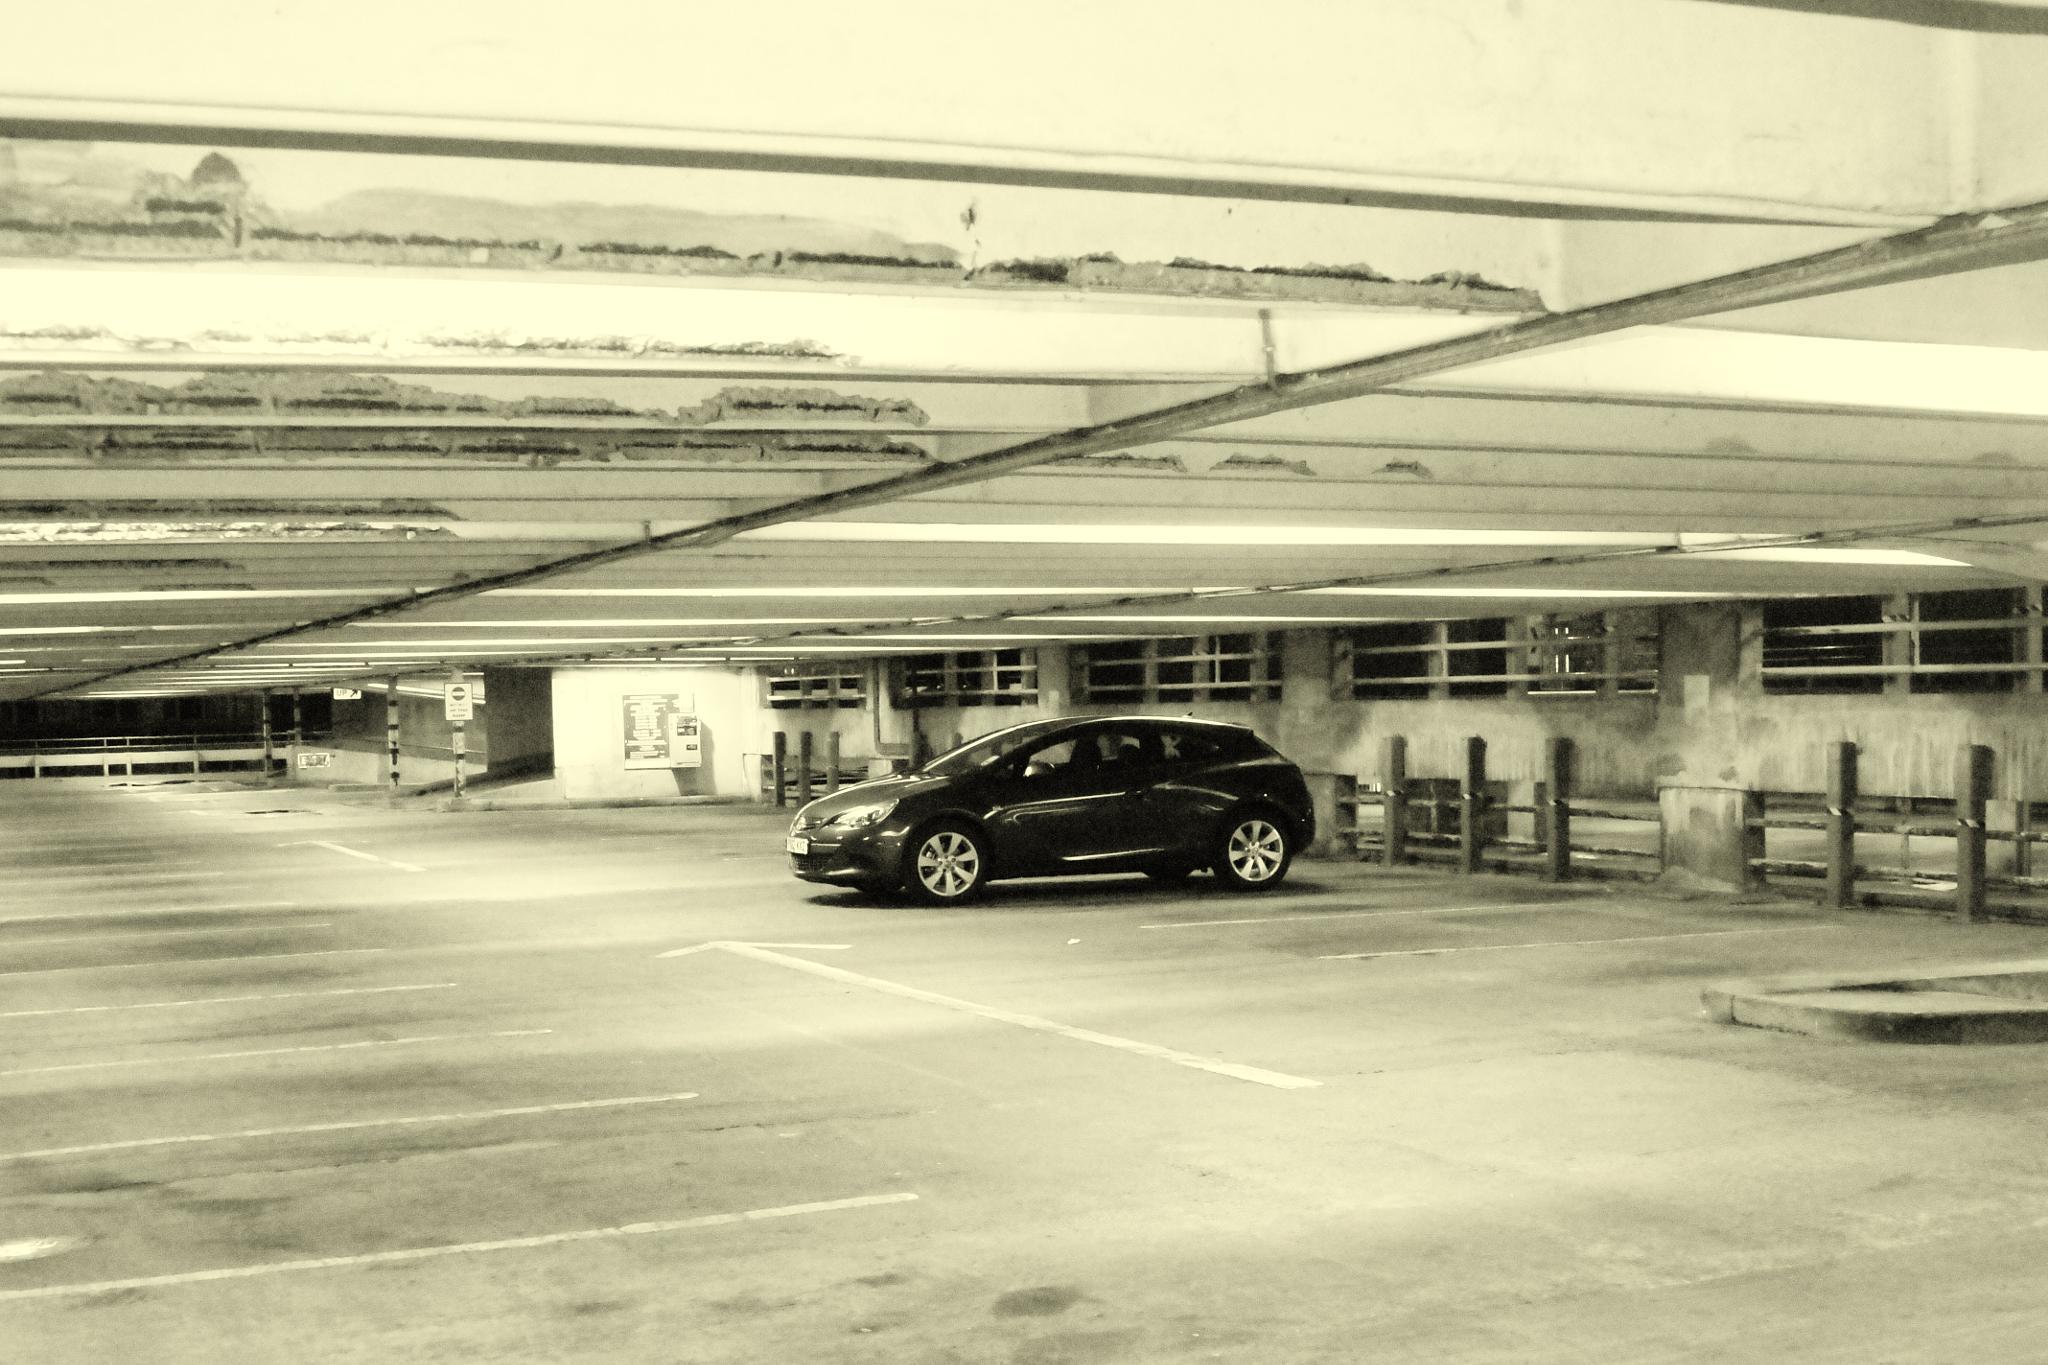 alone by carl.grayphotos